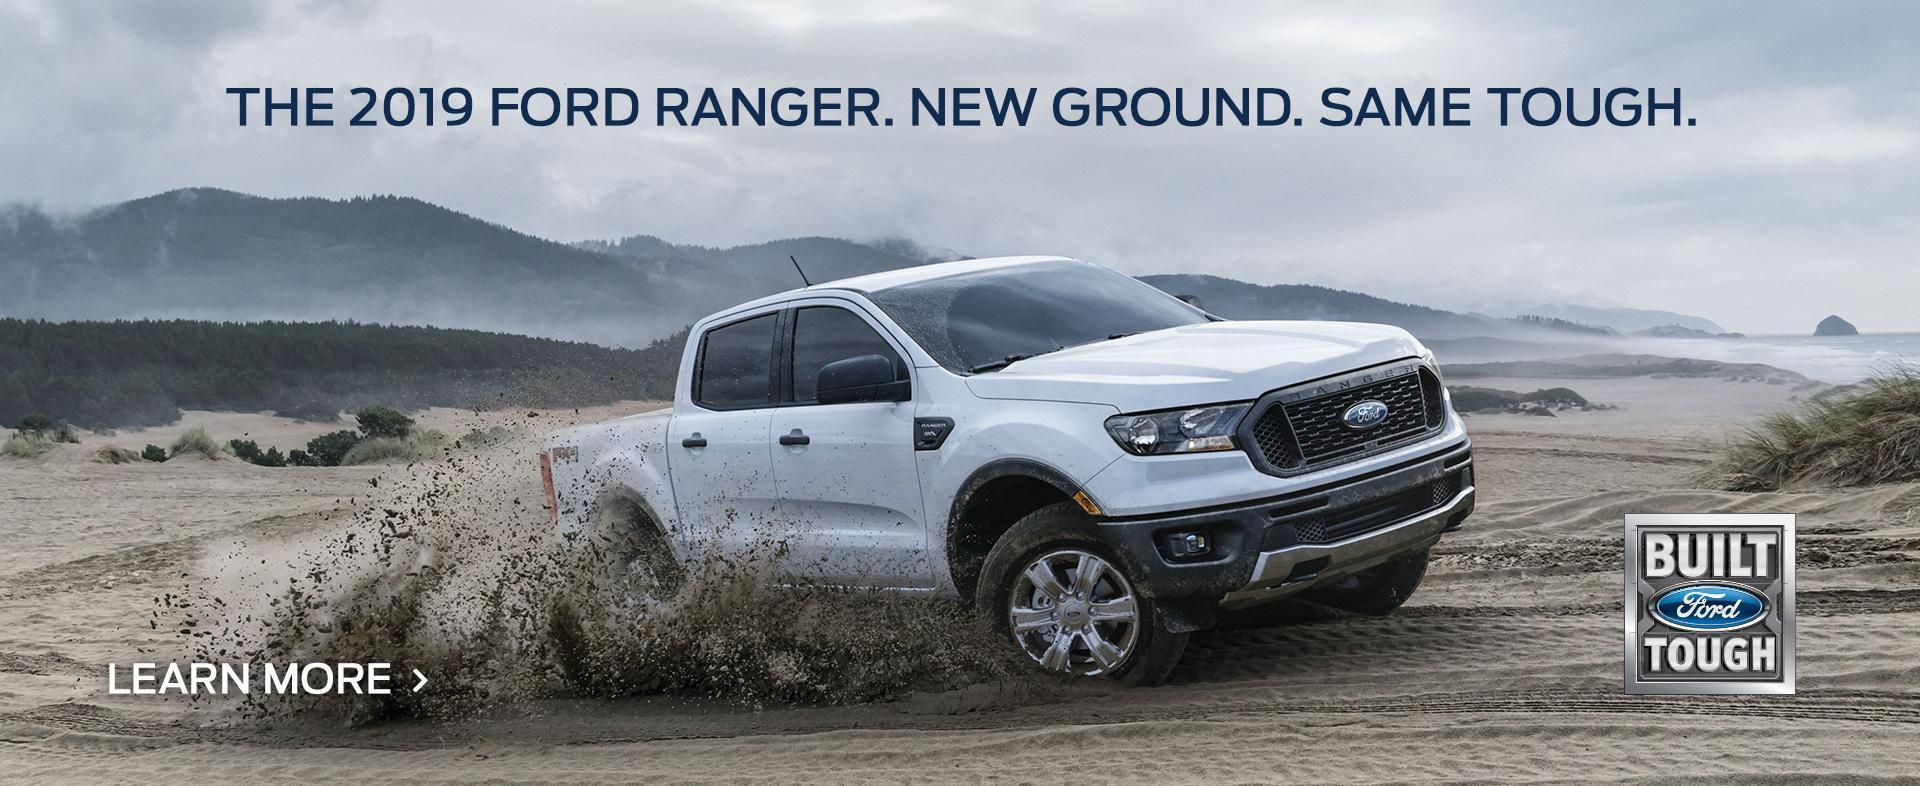 New & Used Ford Cars, Trucks & SUVs Dealership in Calgary